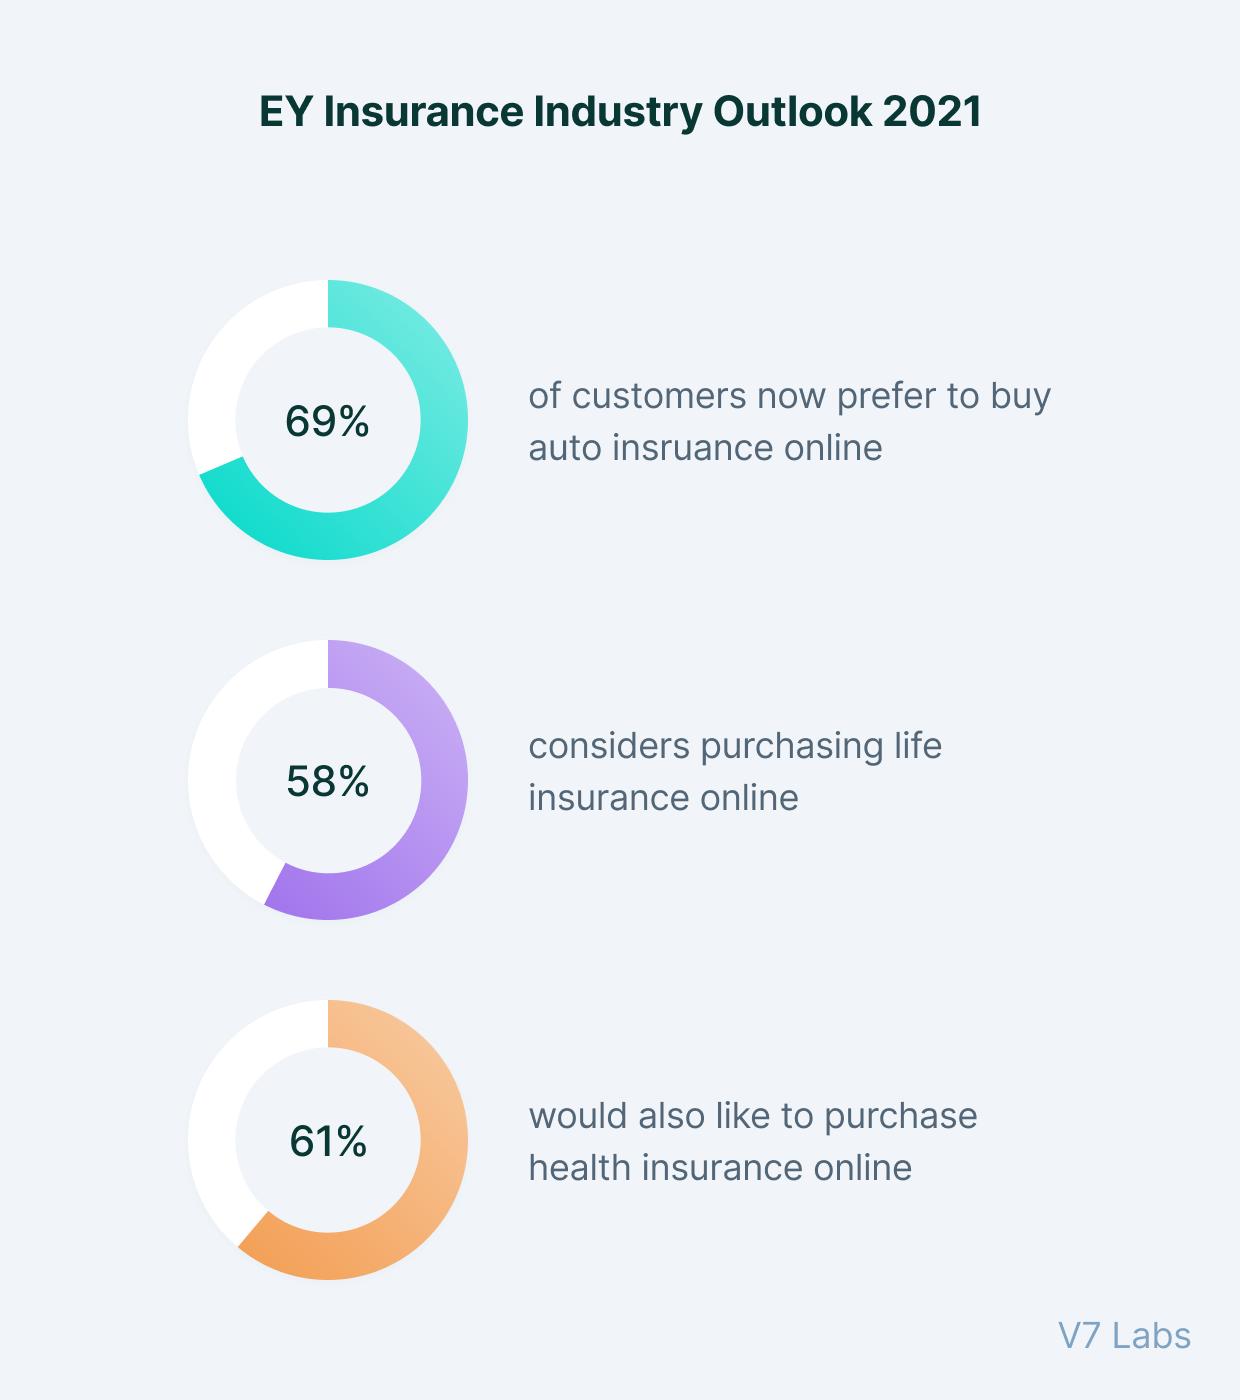 EY Insurance Industry Outlook